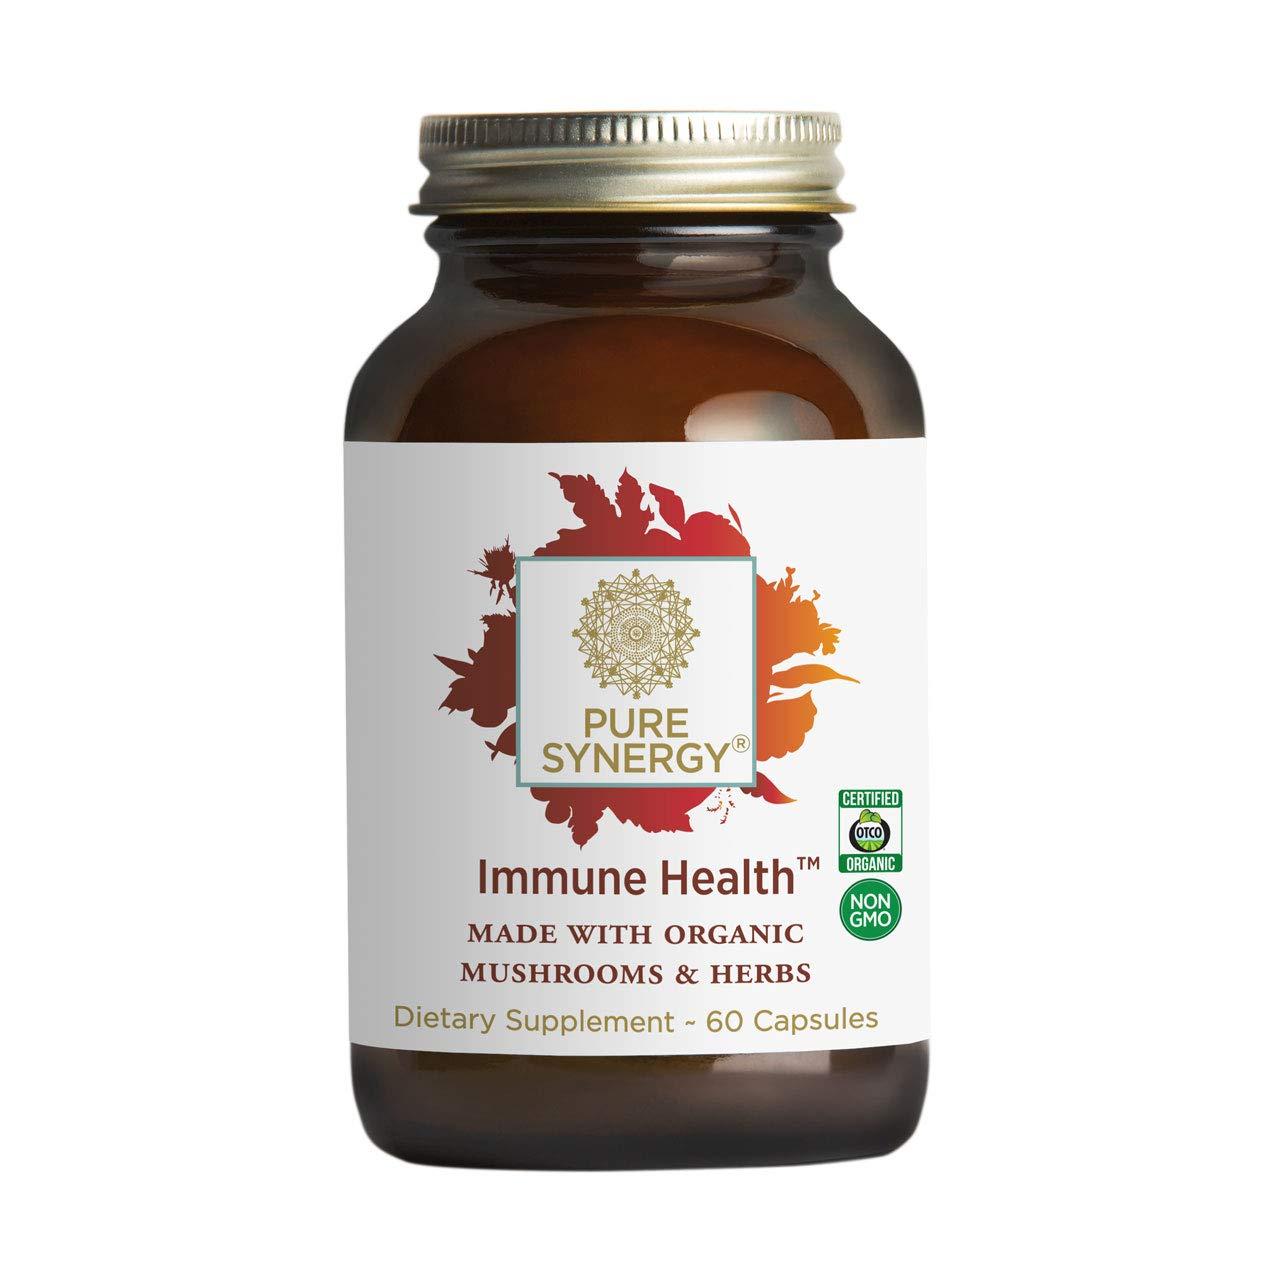 Pure Synergy Immune Health 60 Capsules Daily Immune Supplement w Mushrooms, Astragalus, Fucoidan, Beta-1,3-Glucan